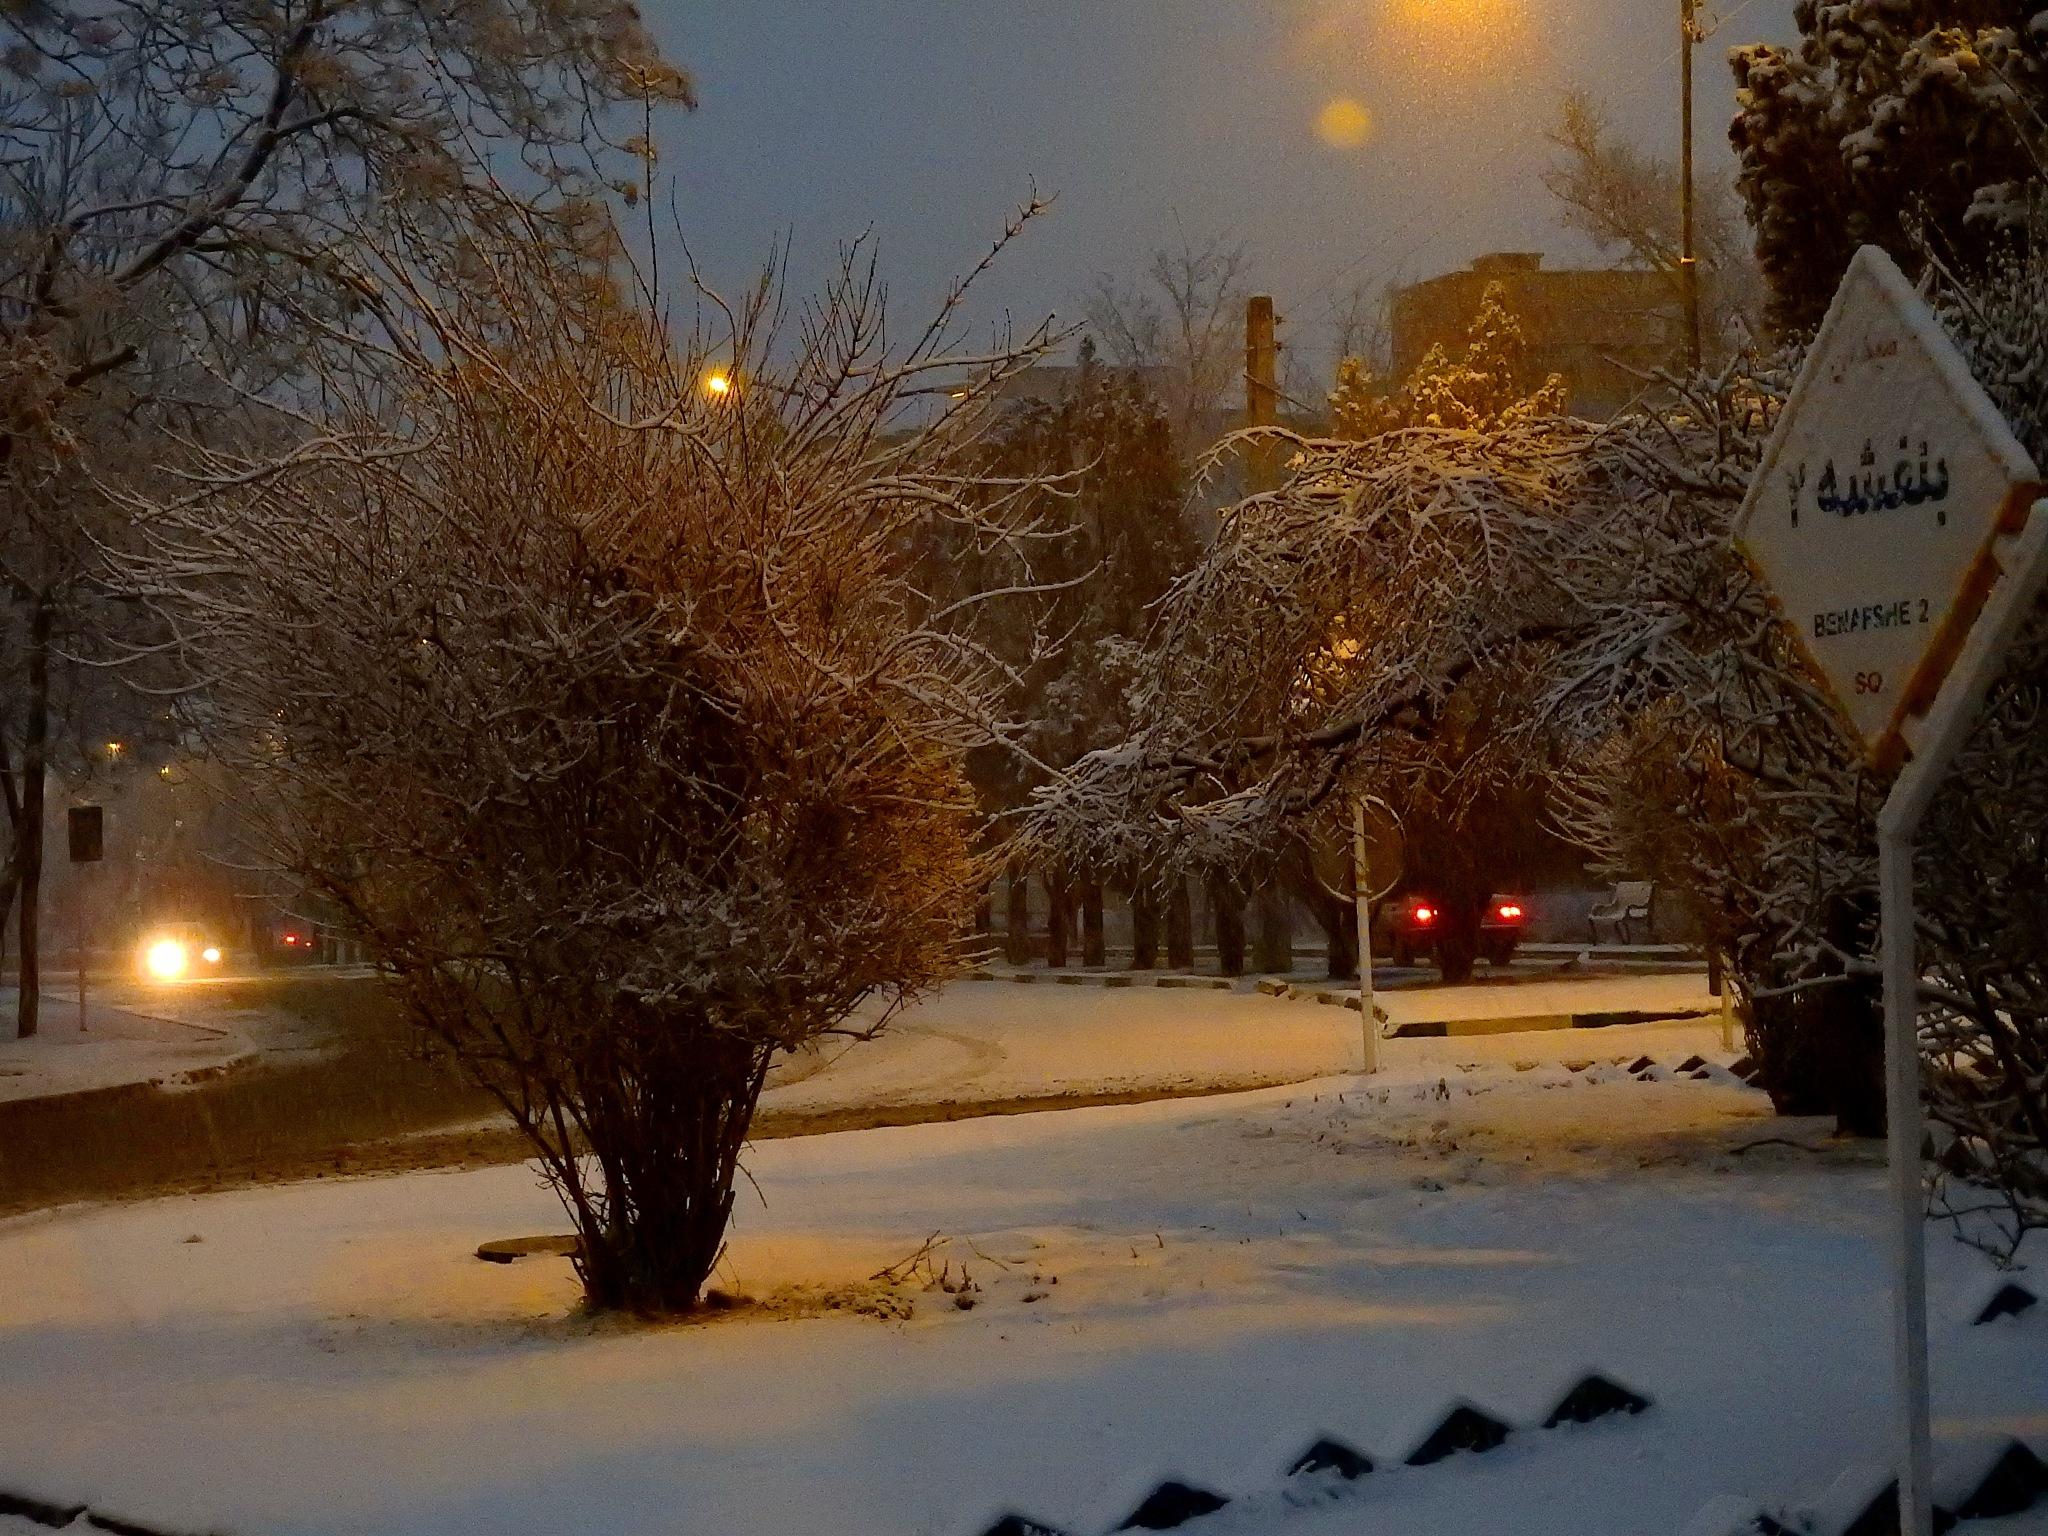 snowy night by Aahmad Hezavei